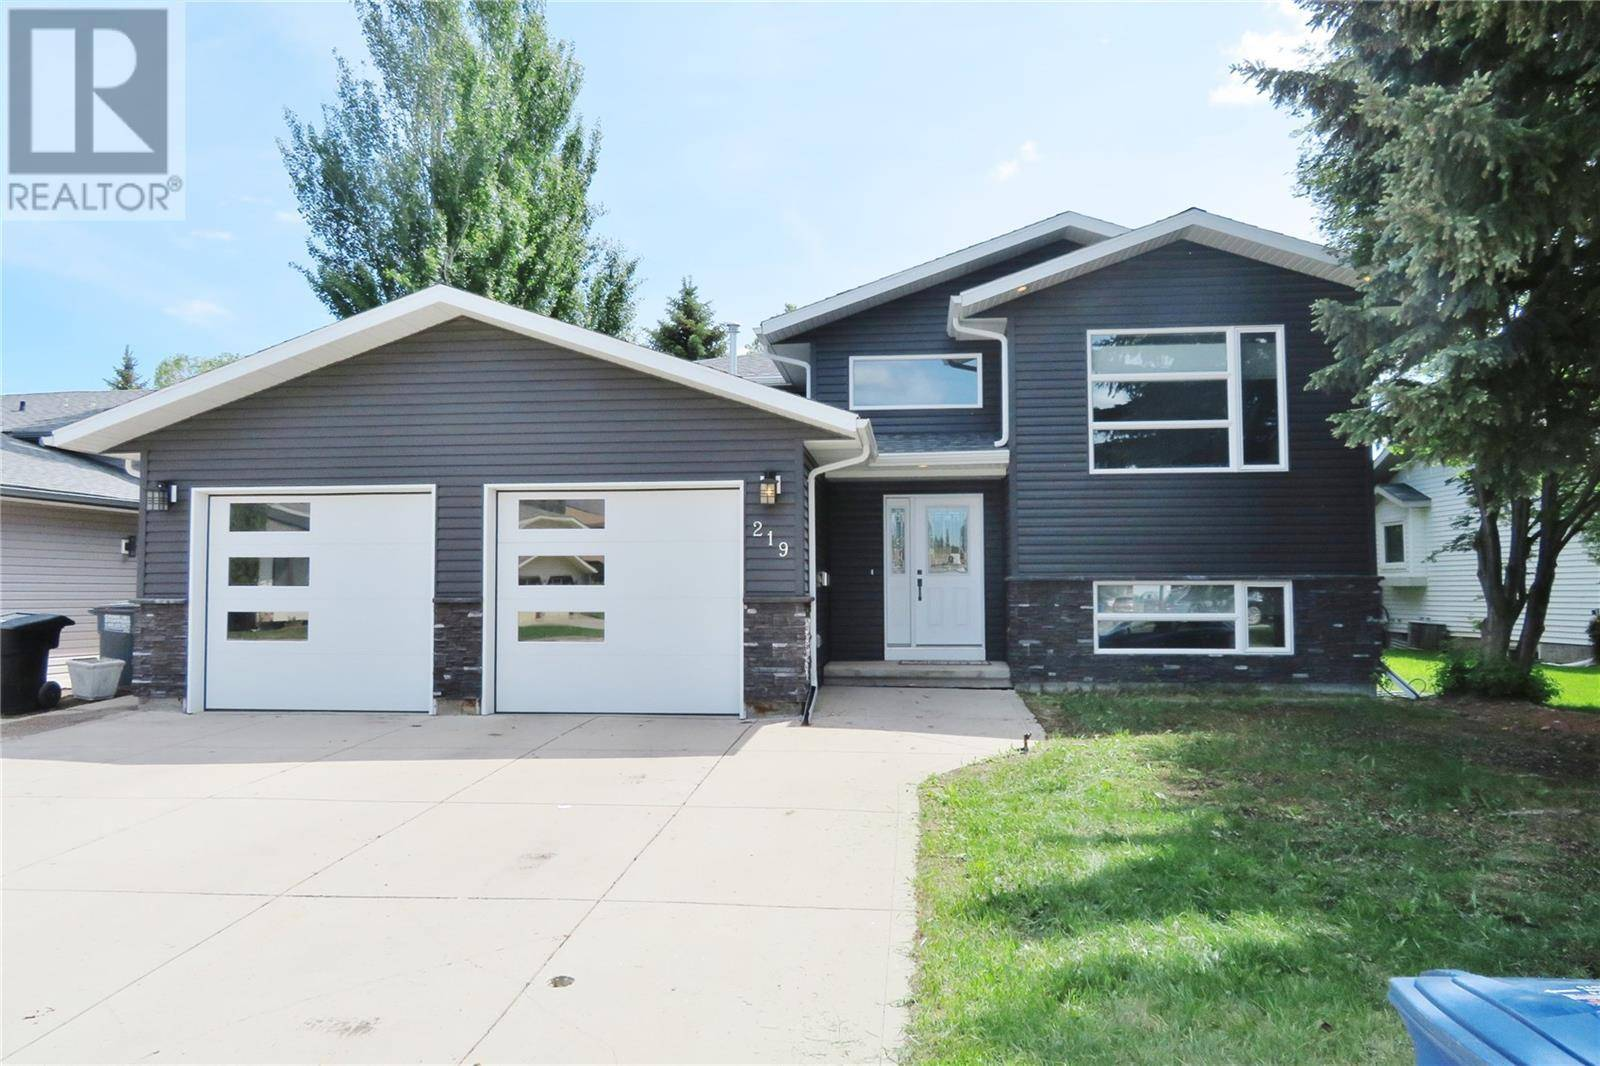 House for sale at 219 Cowley Rd Saskatoon Saskatchewan - MLS: SK792390